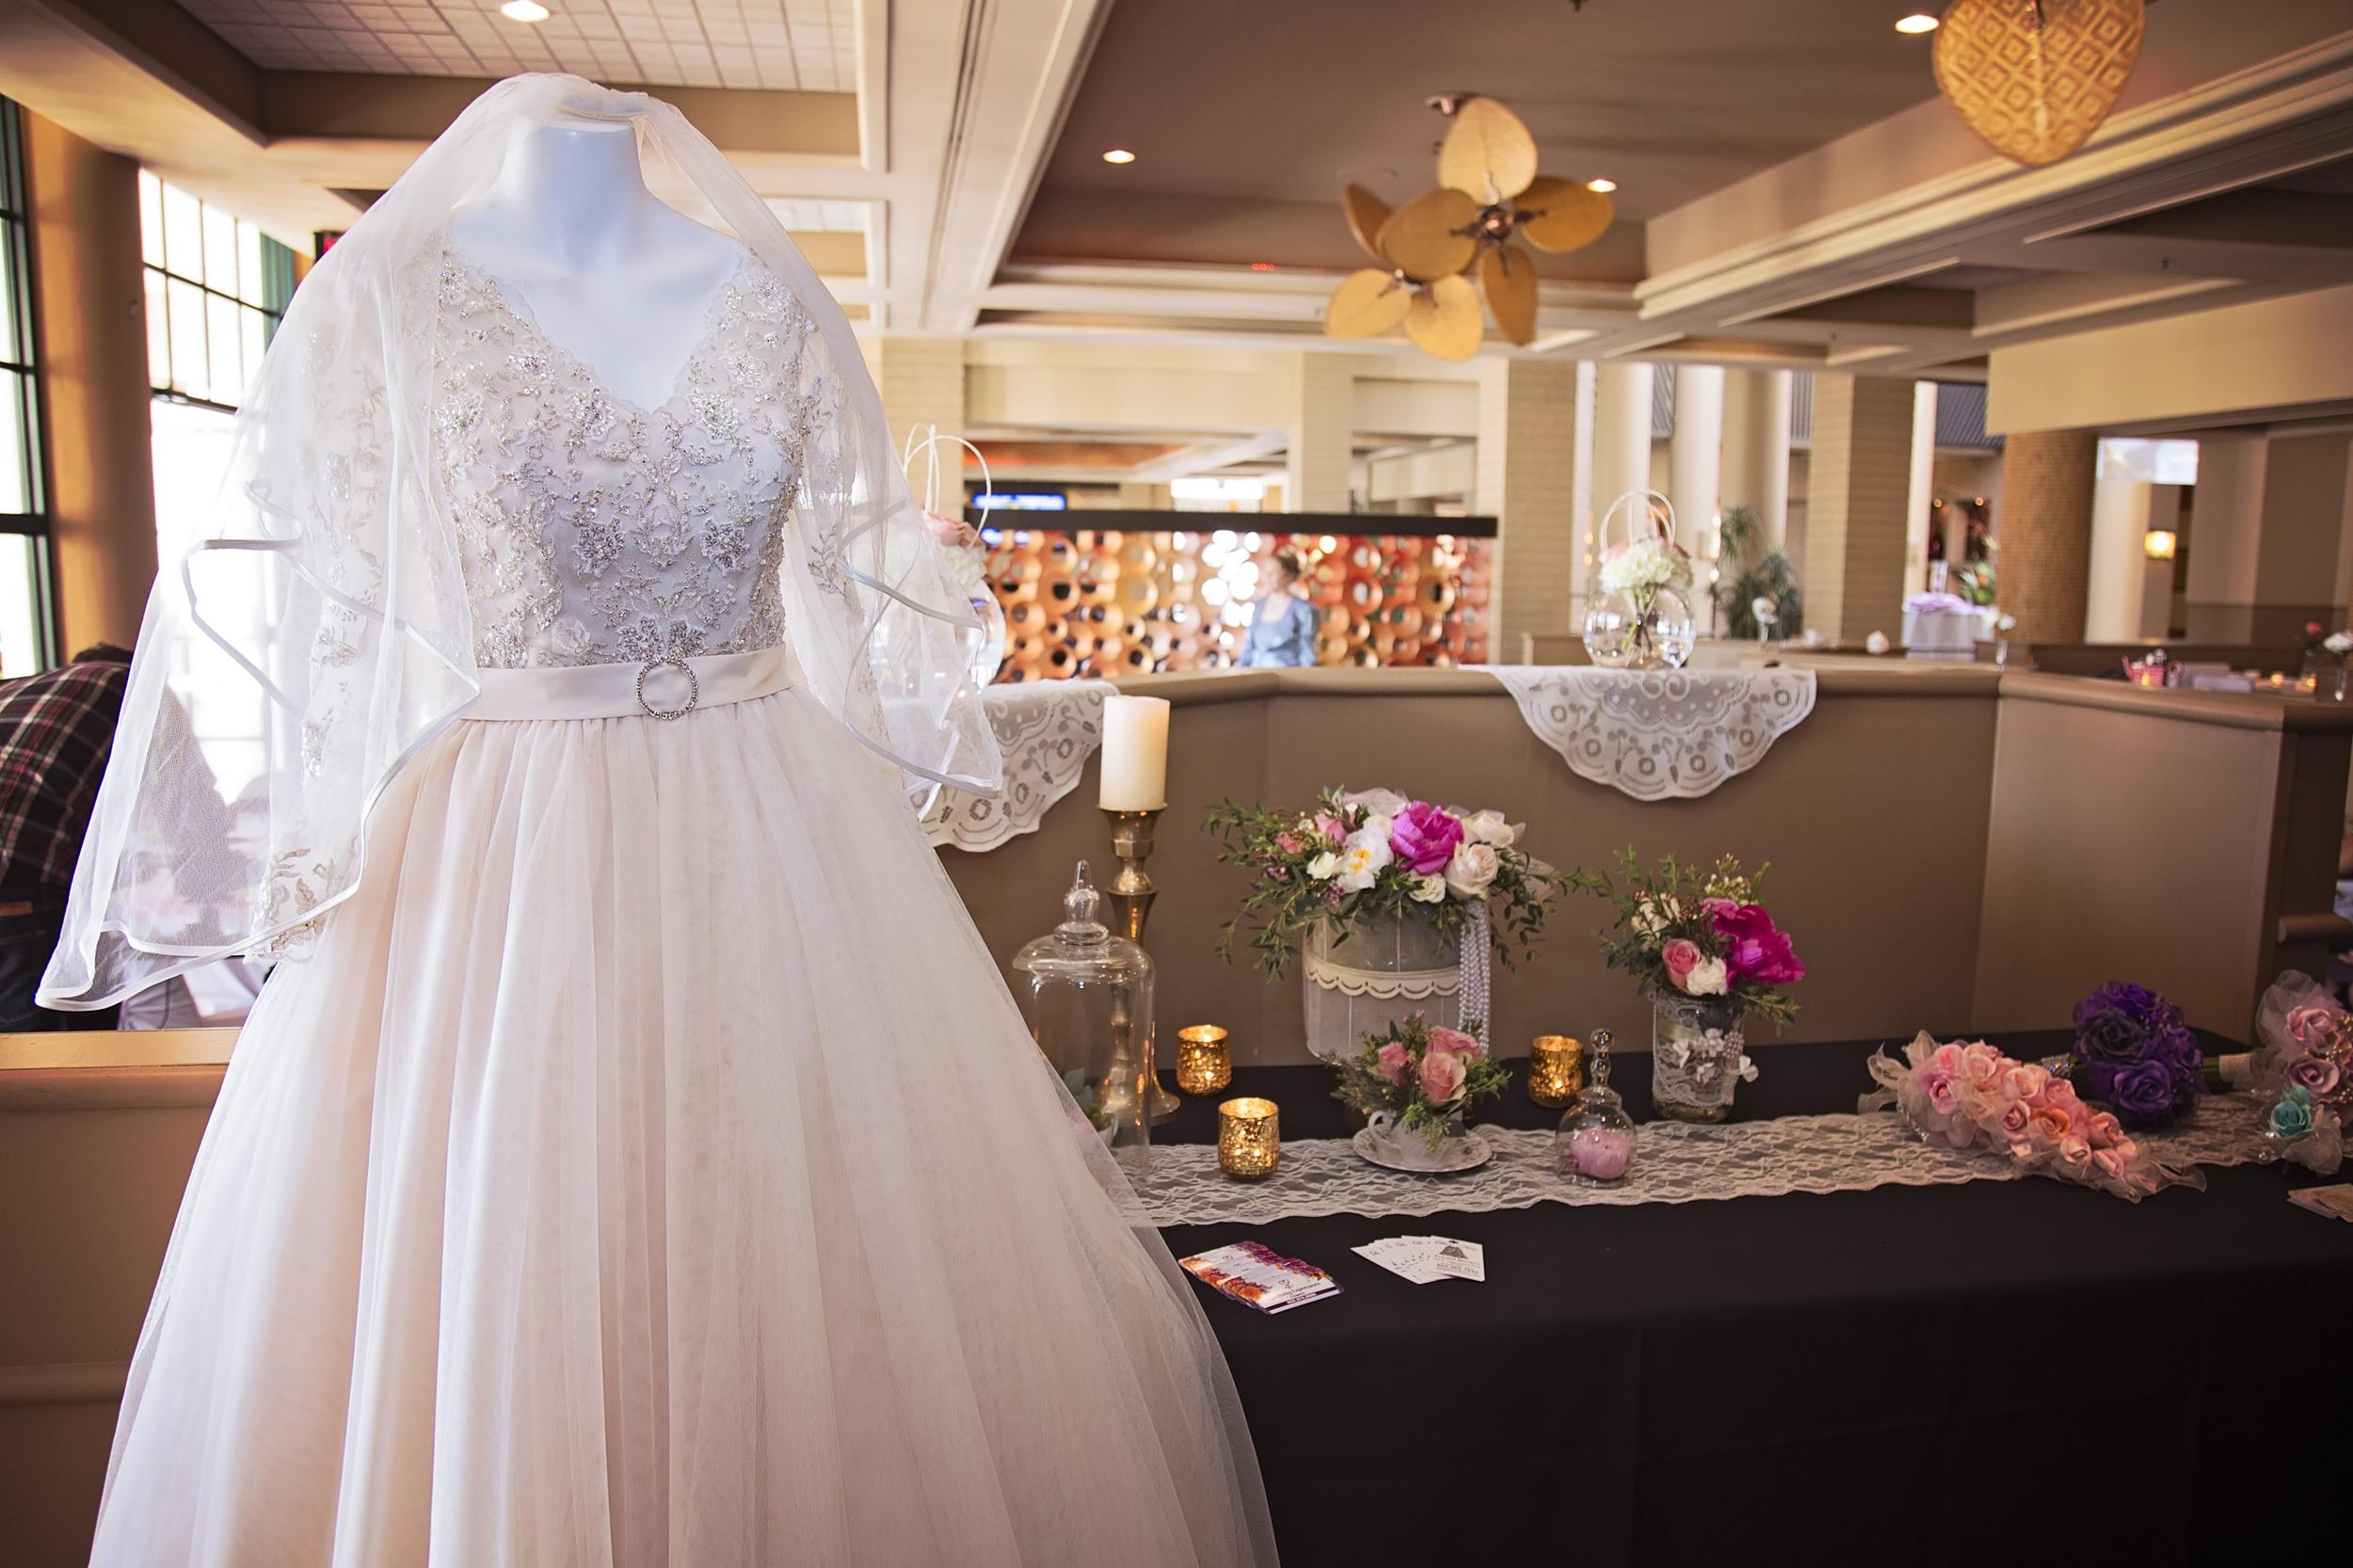 Enchanted Wedding Tours - Tea 1.30.16-32.jpg